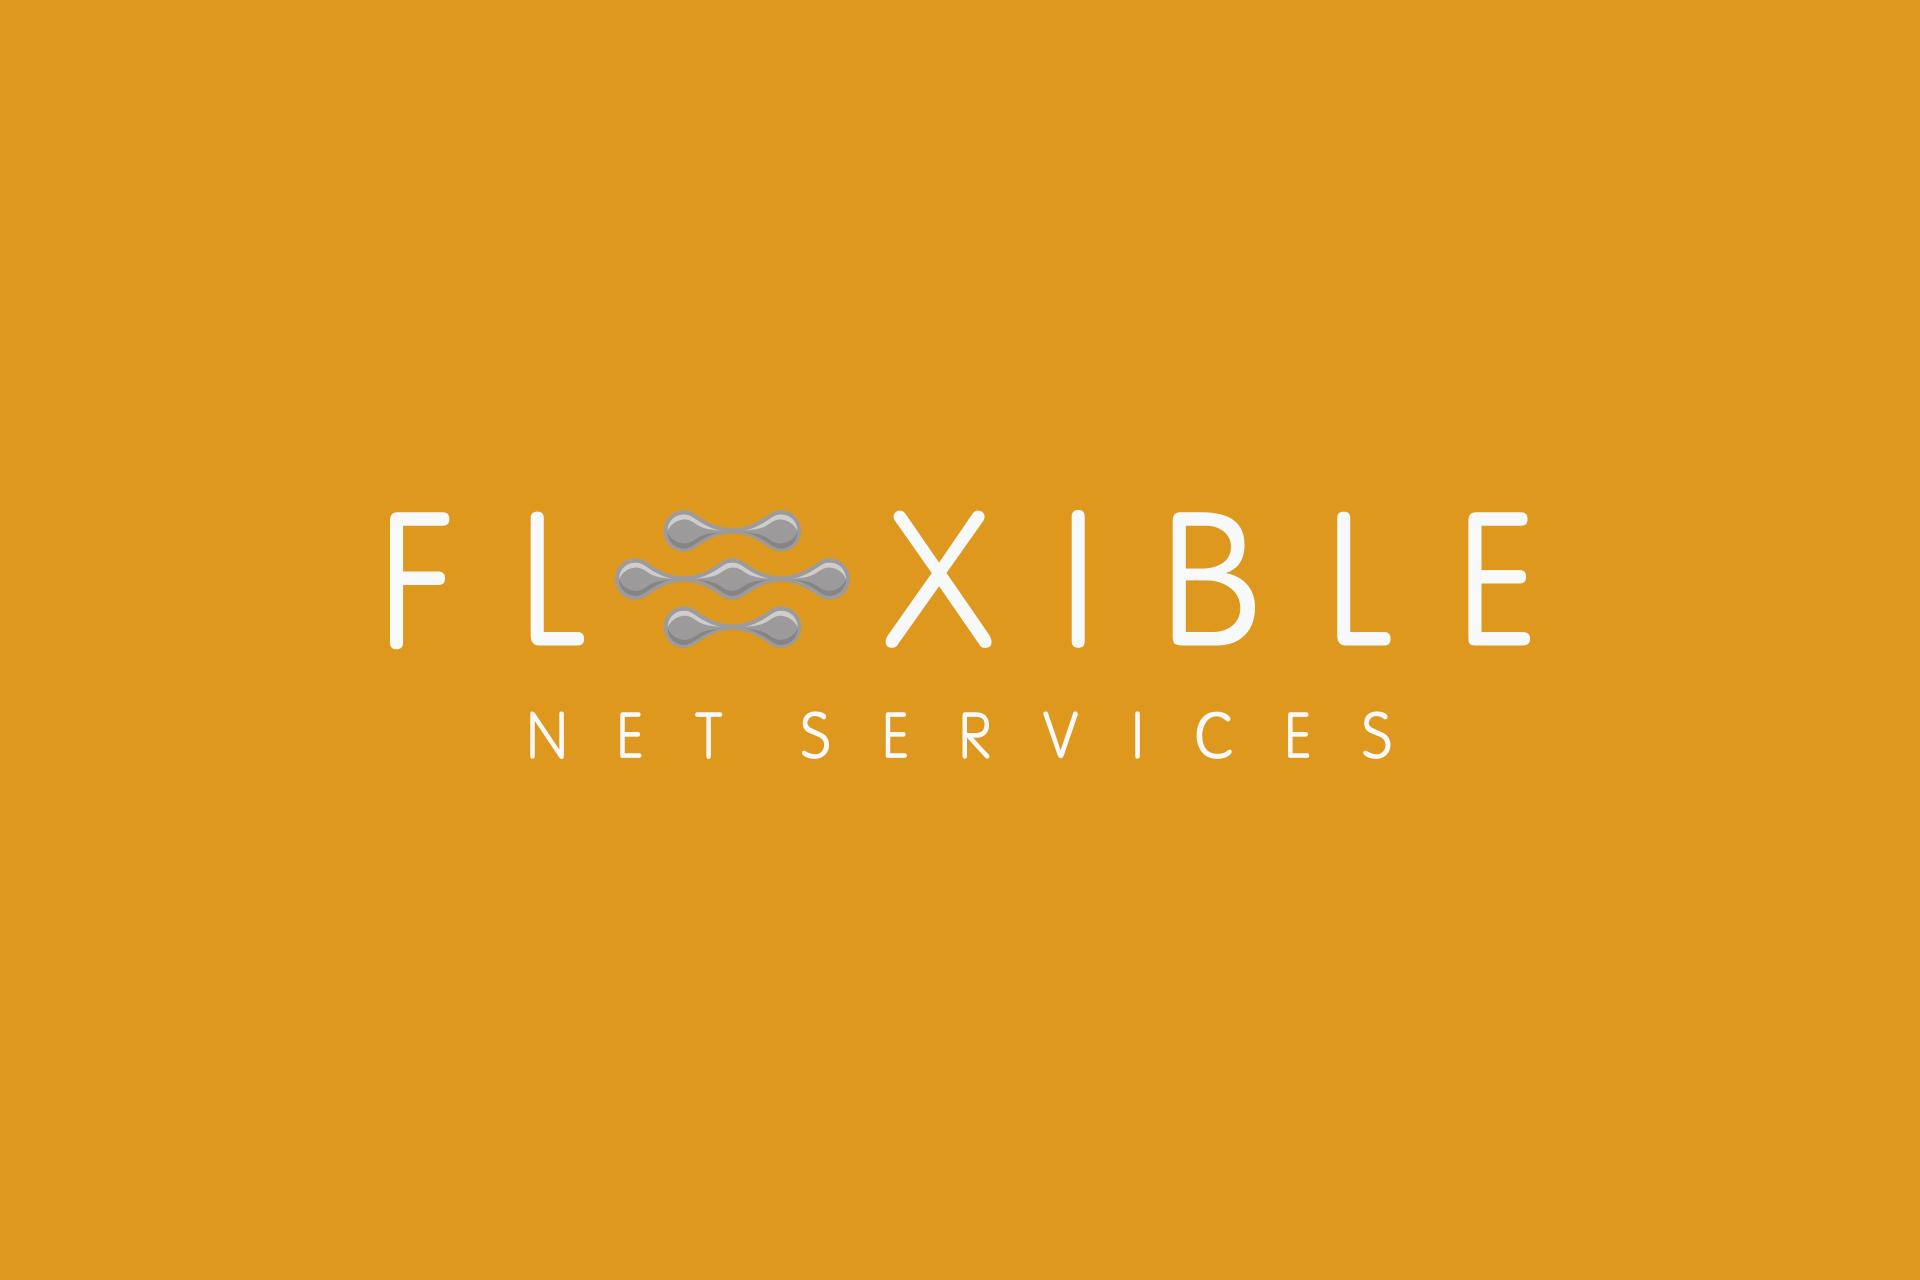 flexible services